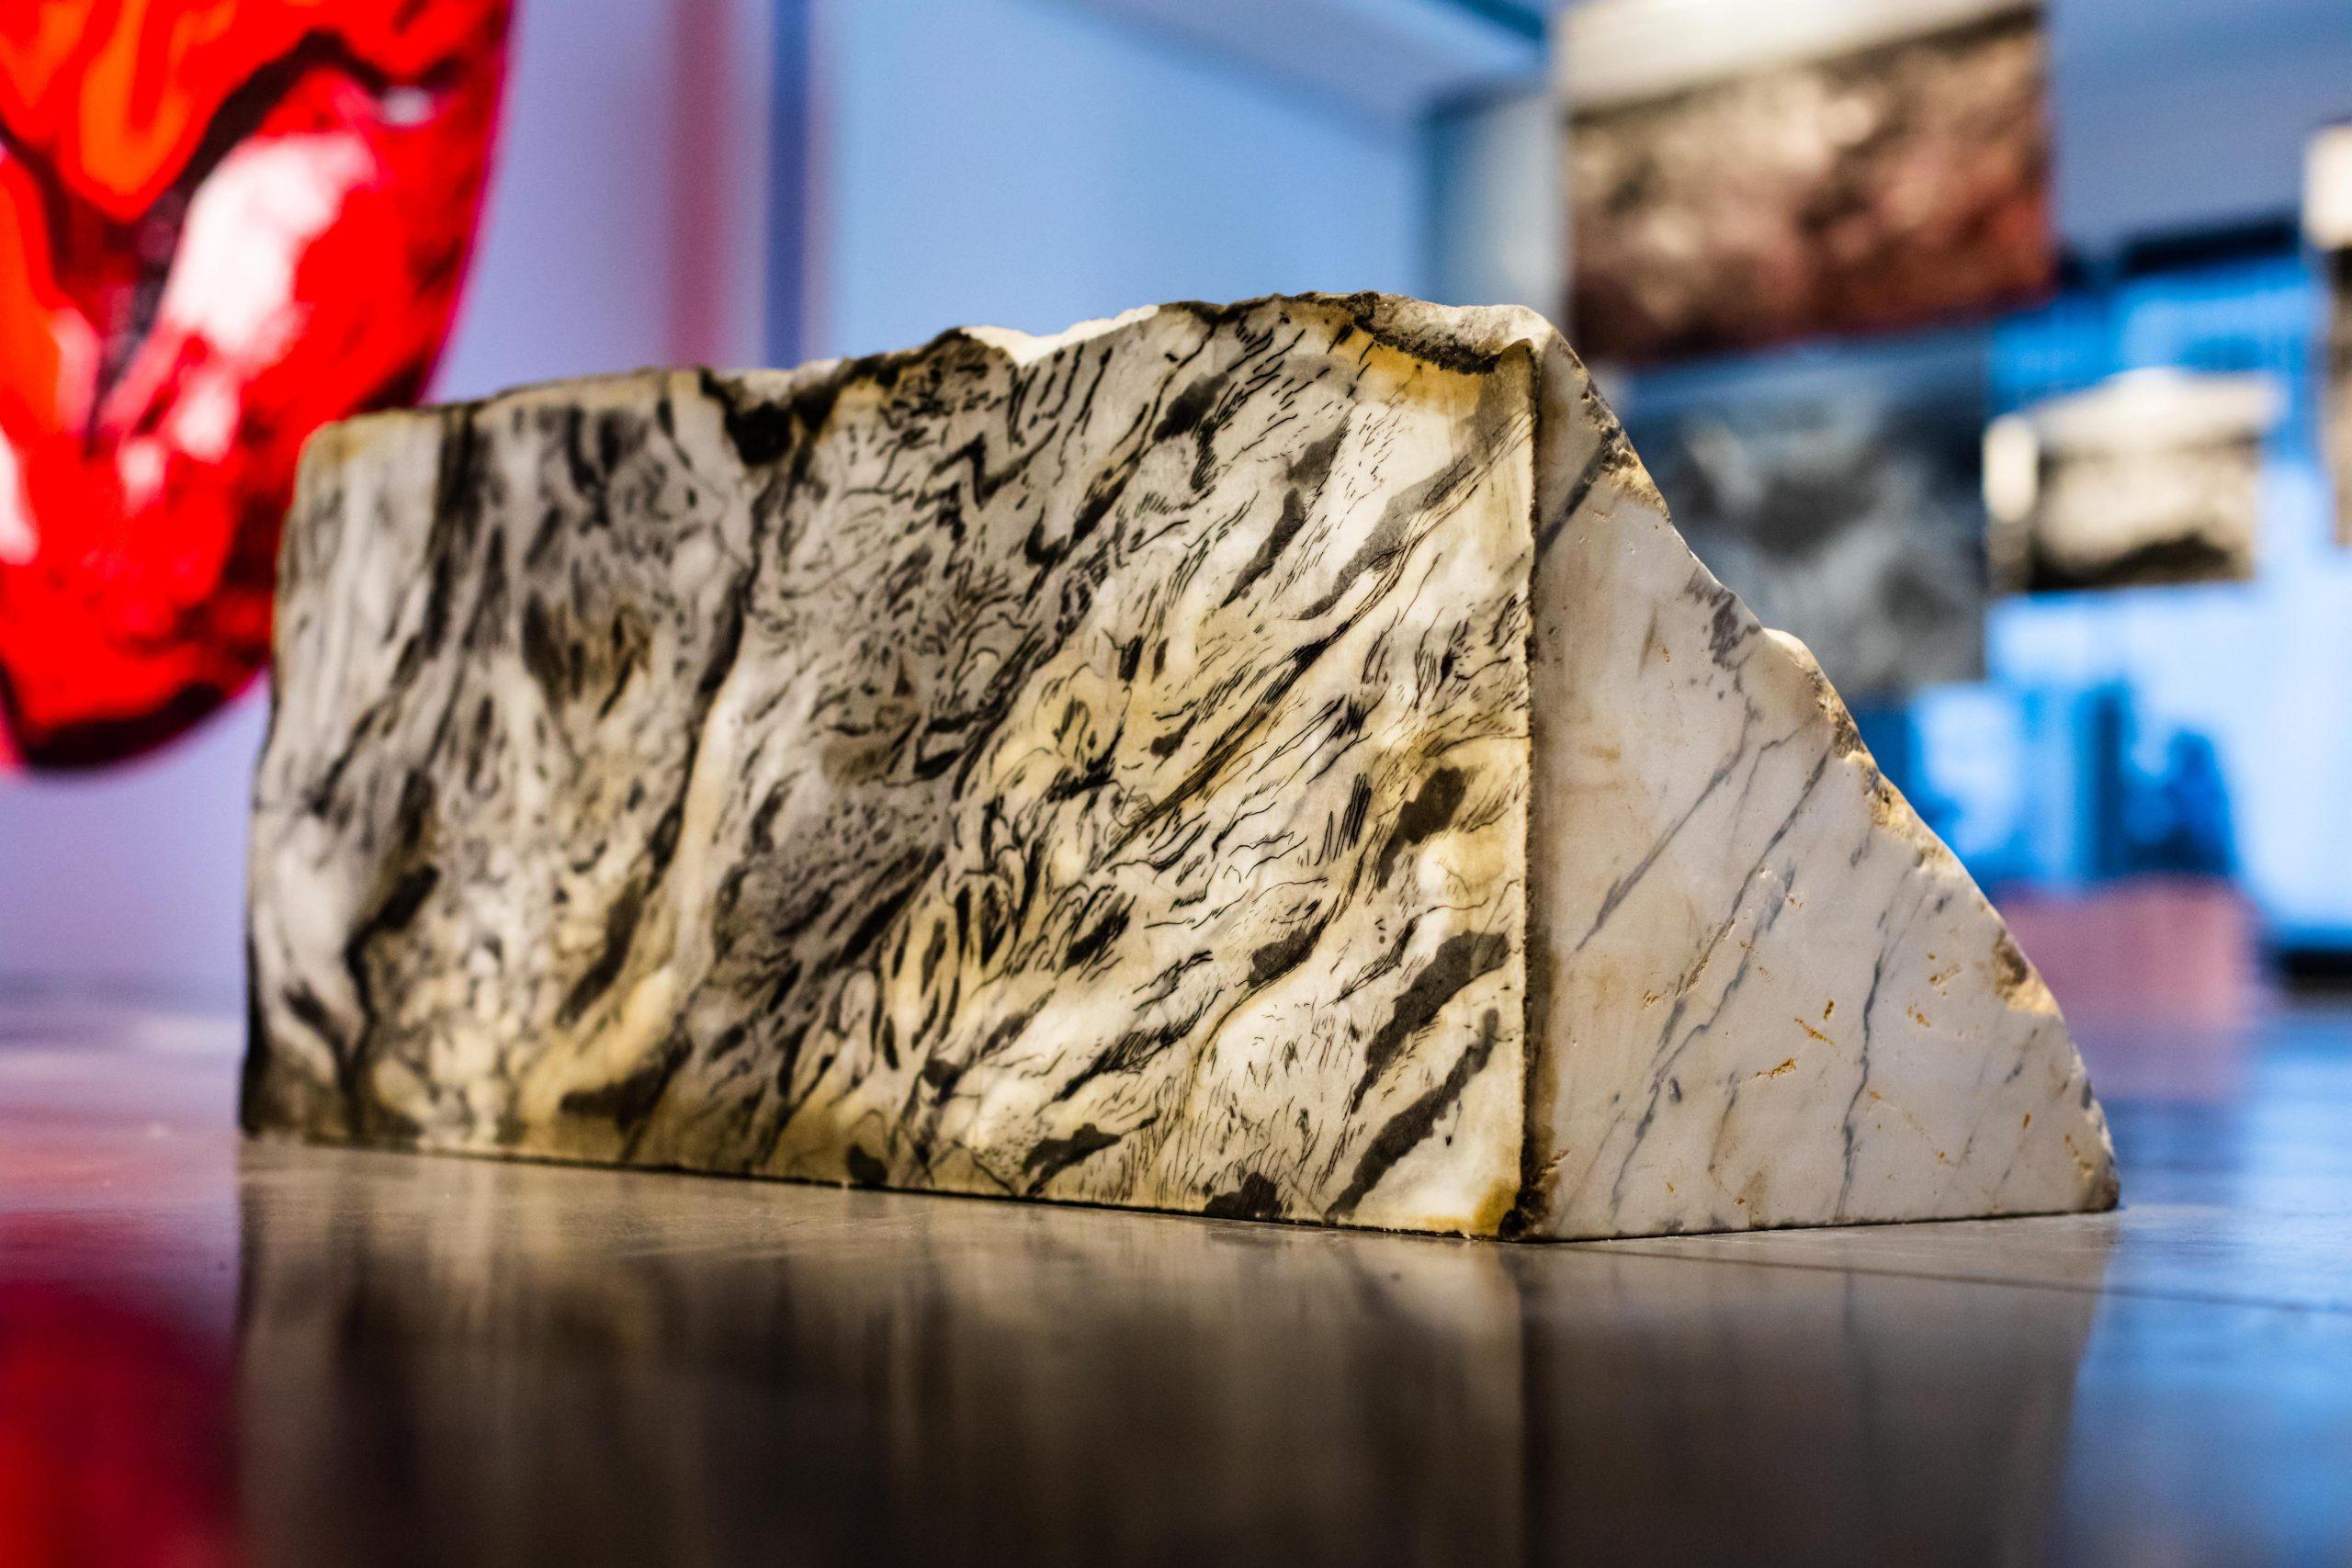 Threshold 15, 2018, Ink on Statuario marble, 30 x 30 x 70 cm